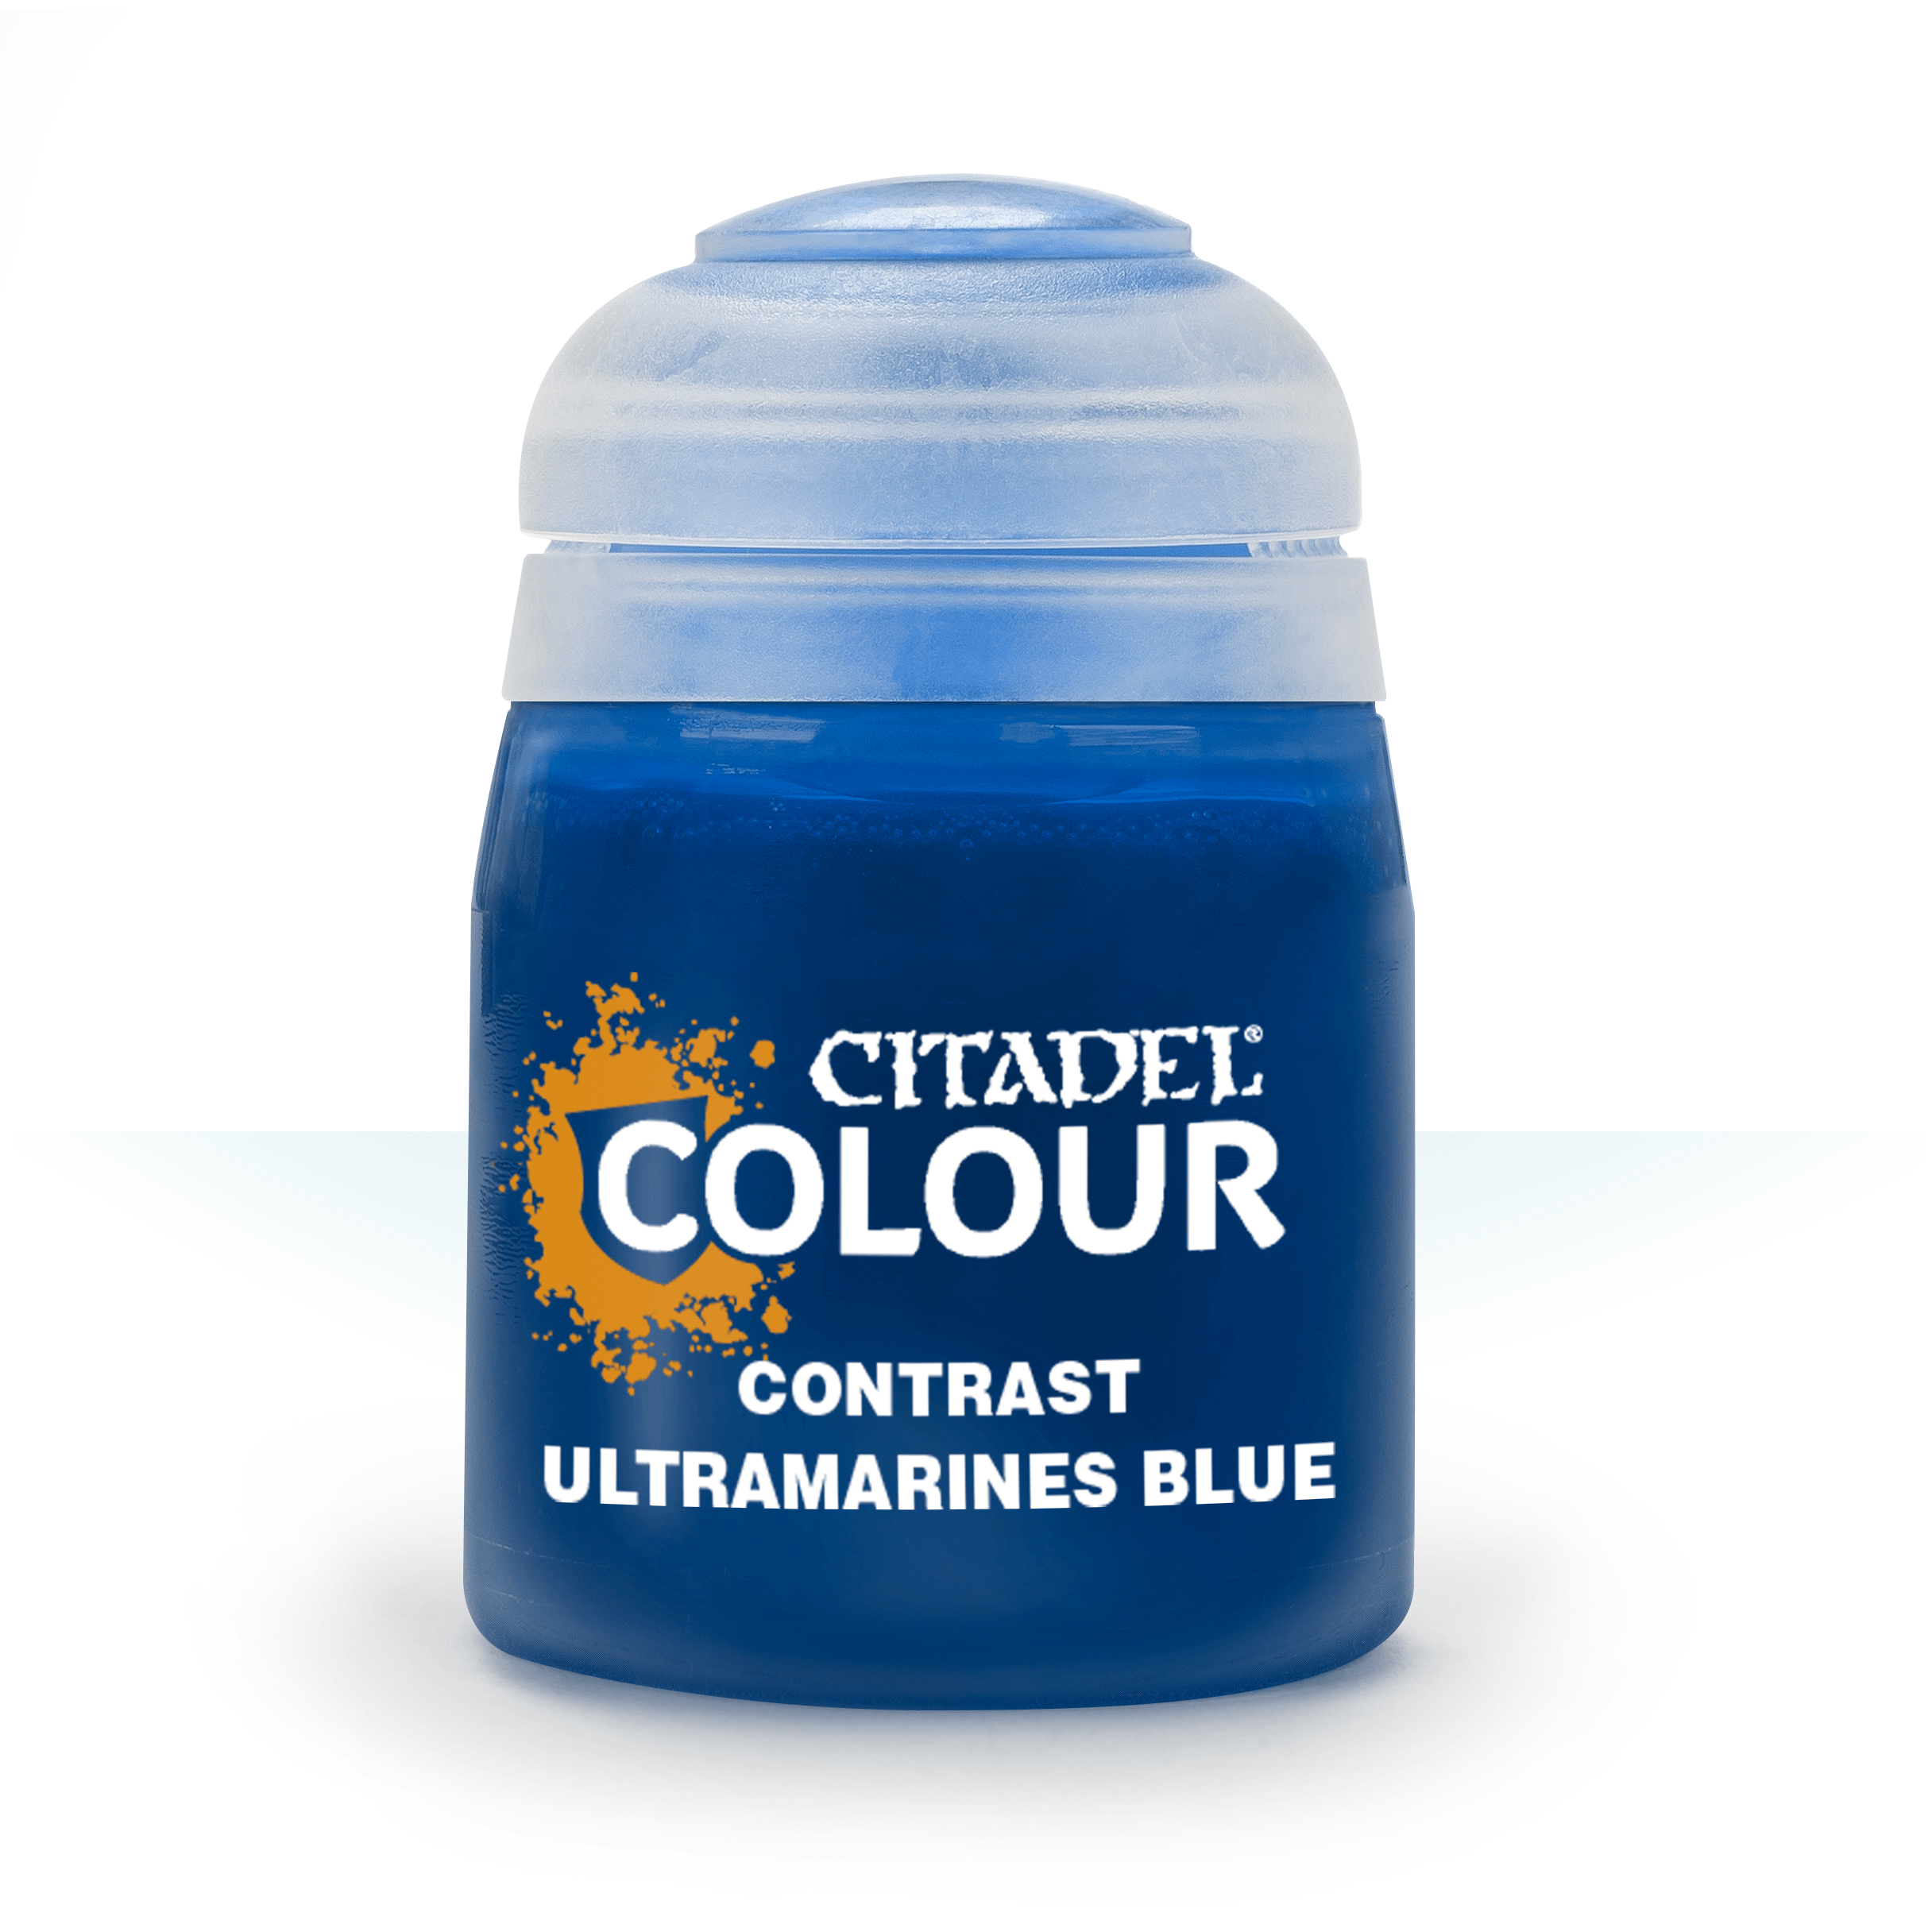 Ultramarines Blue, Citadel Contrast 18ml